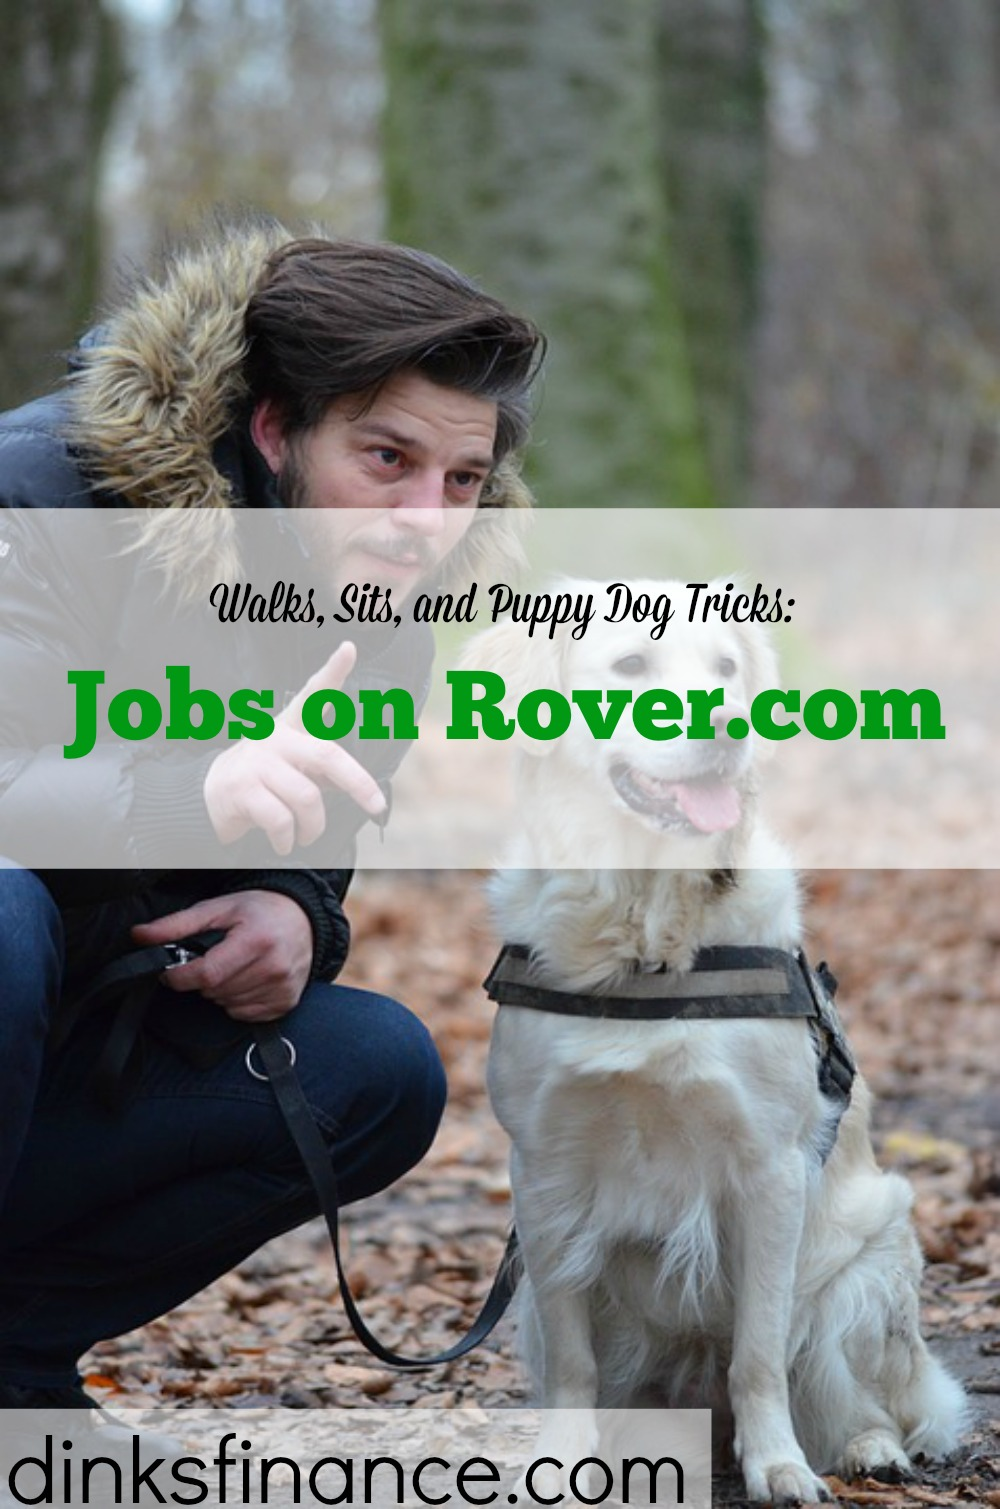 dog walker, jobs for dog lovers, rover.com